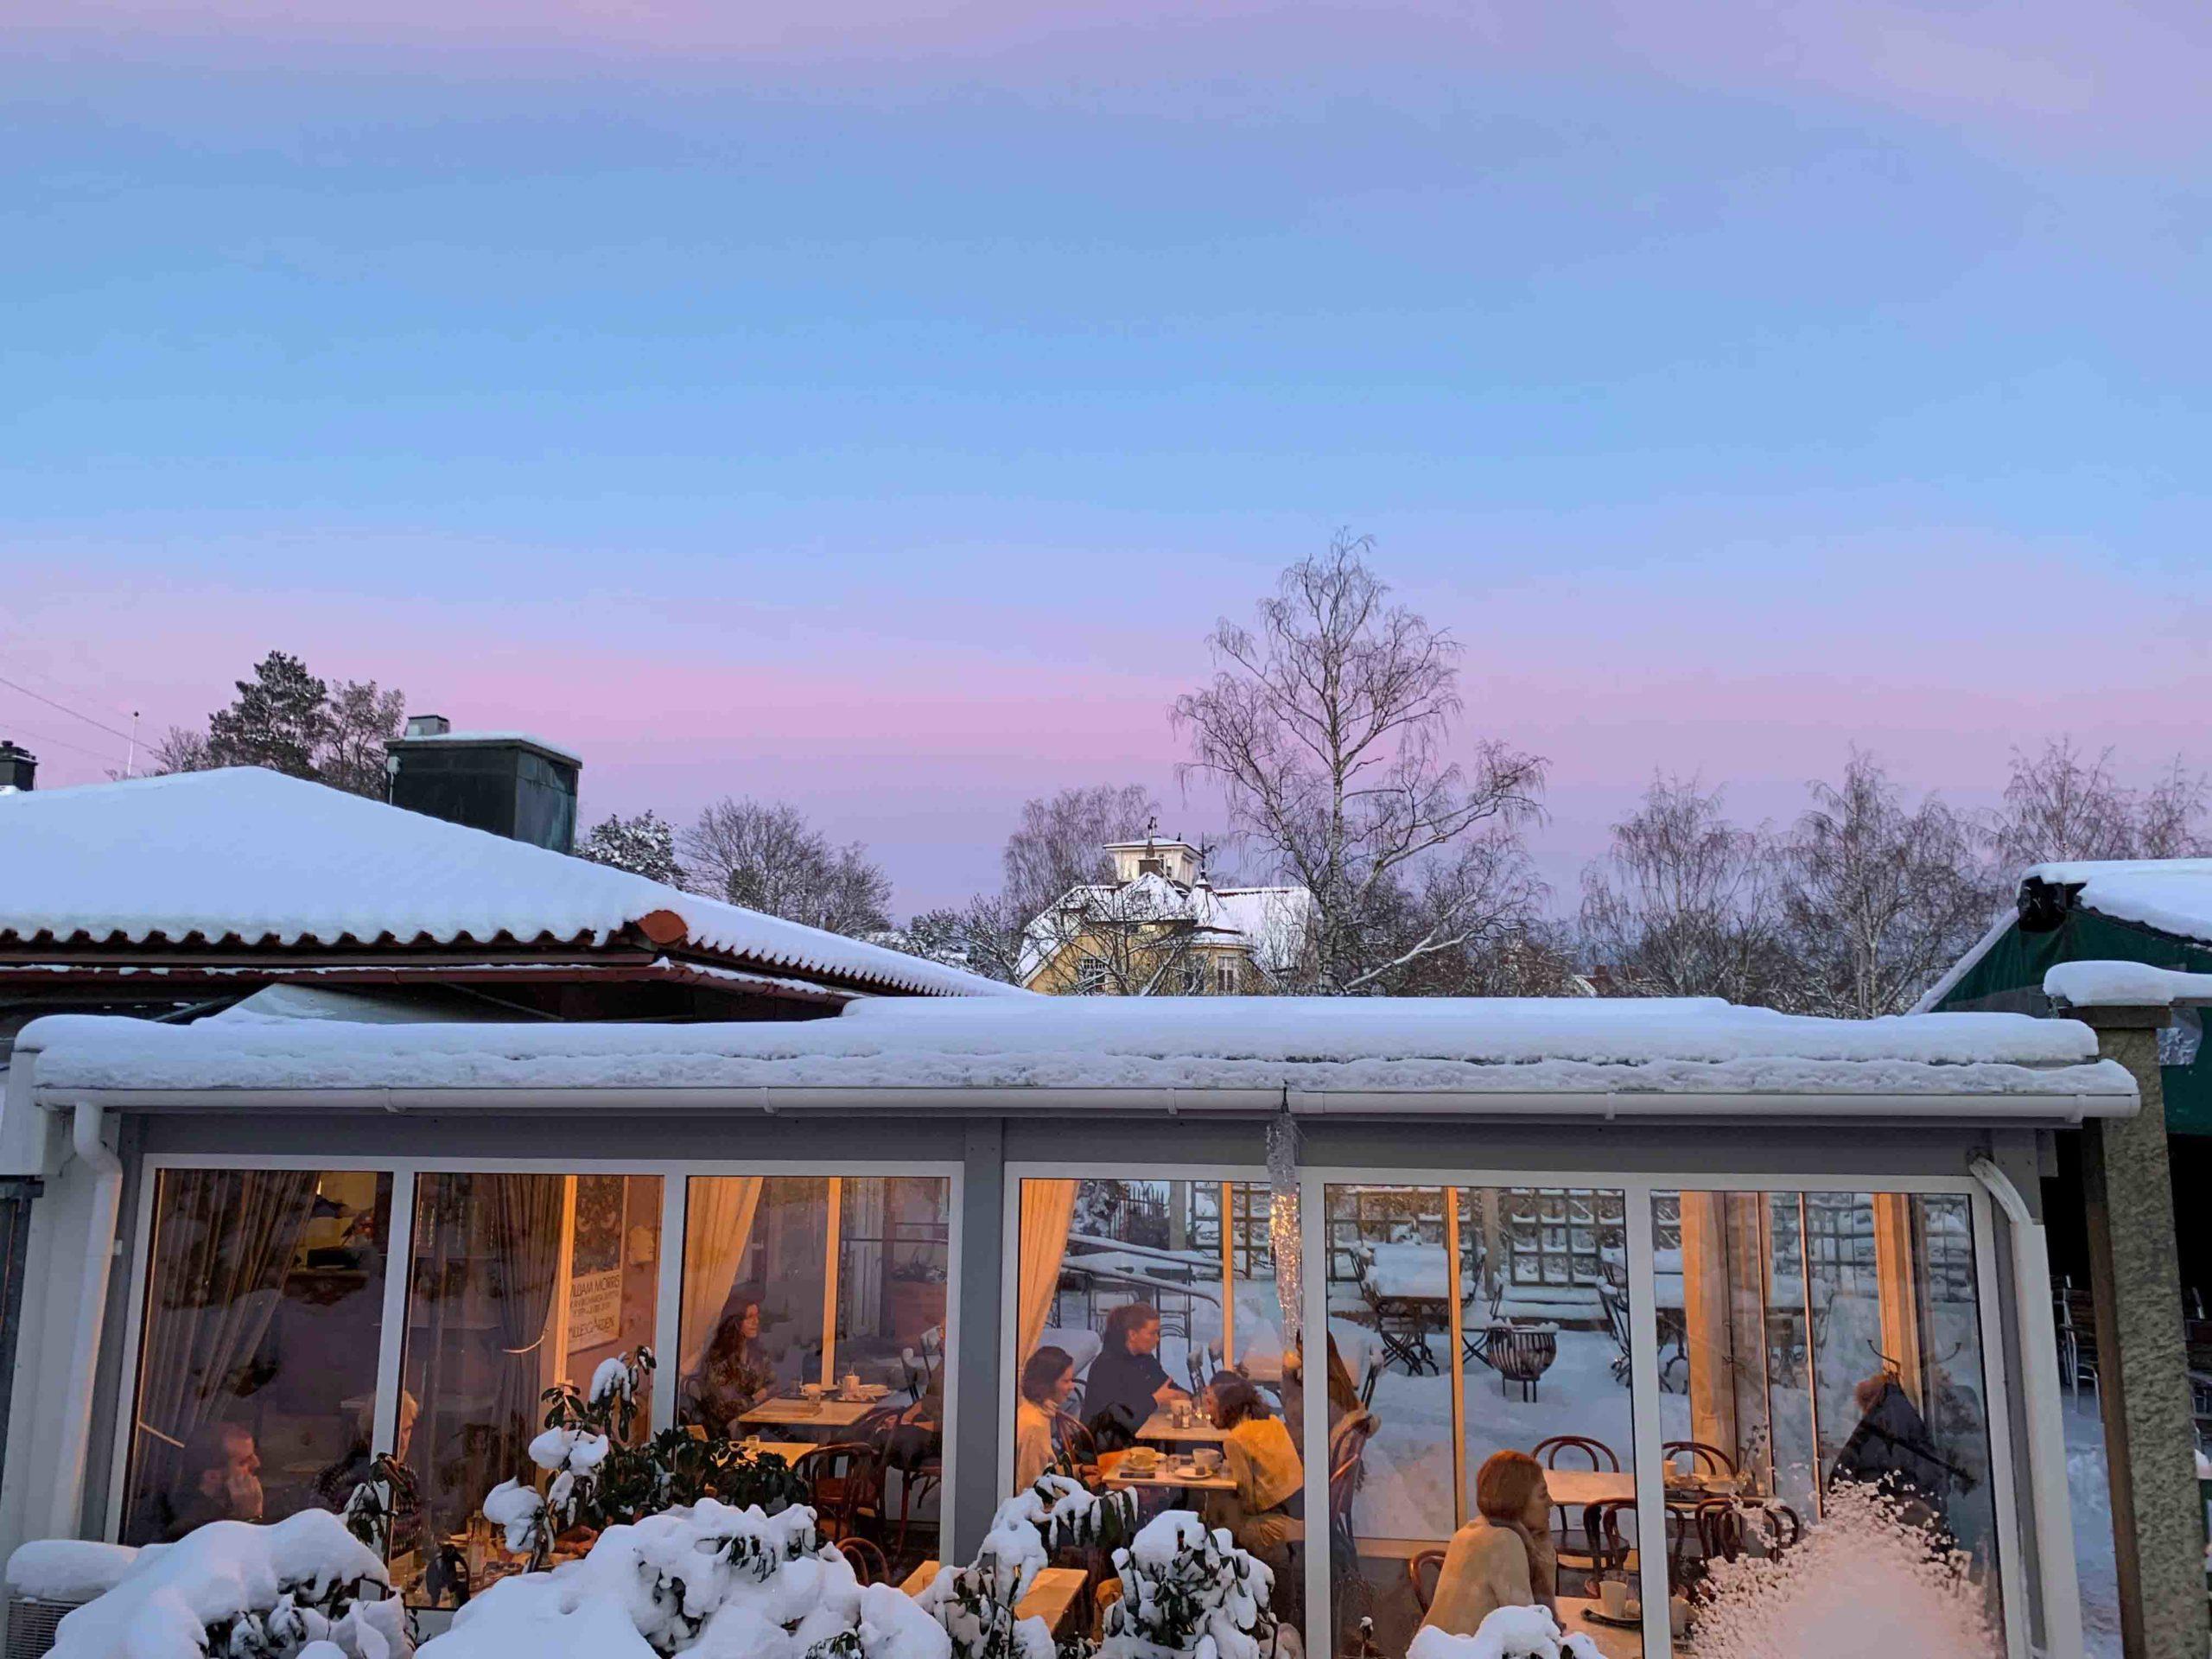 snowy exterior of restaurant in Sweden